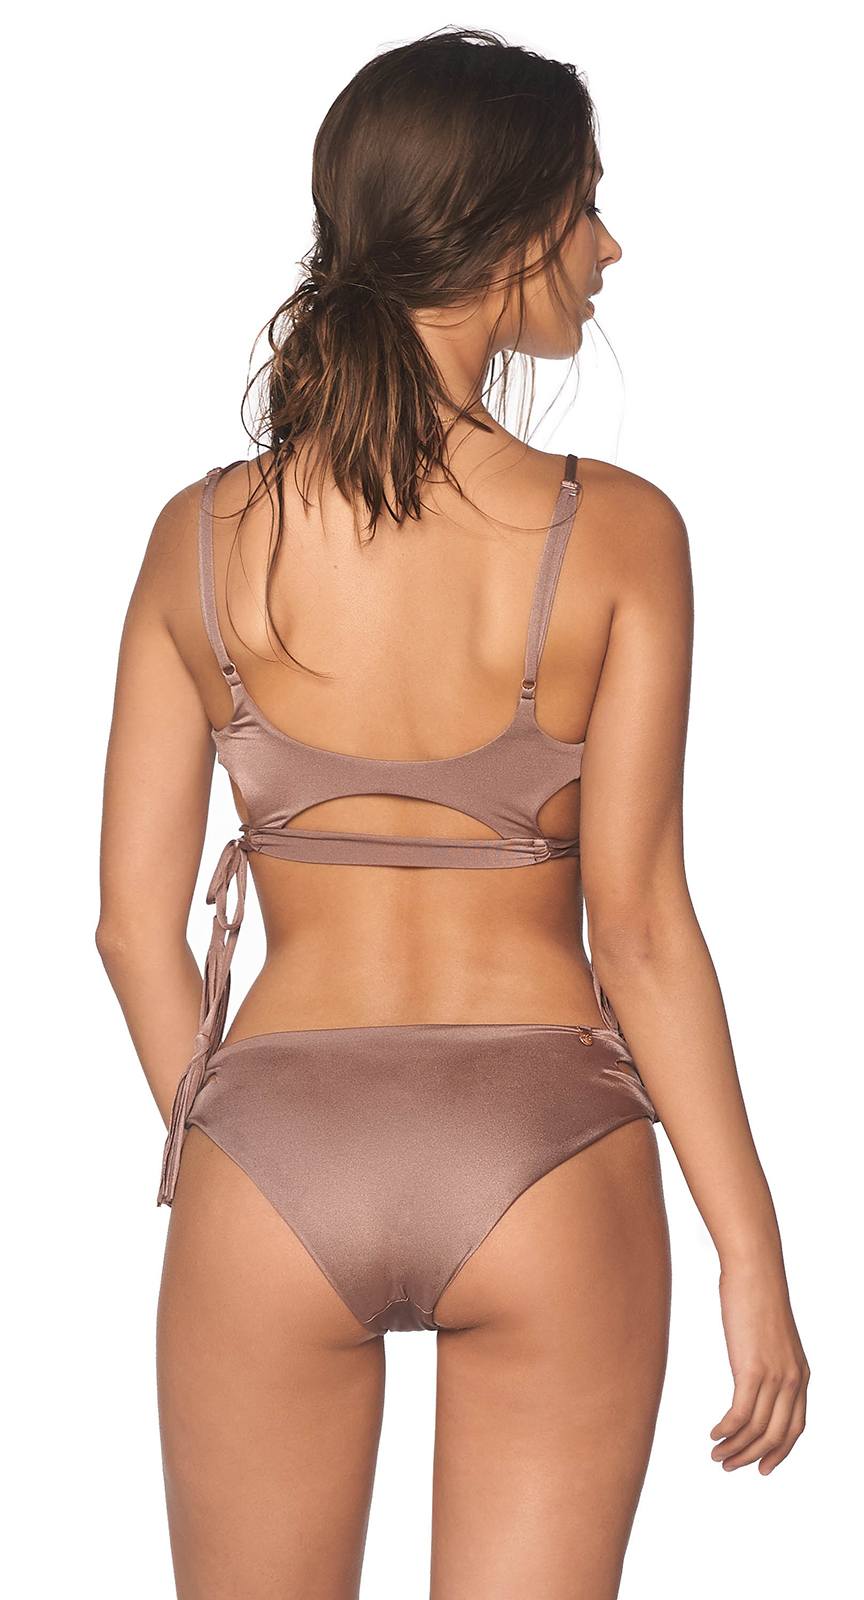 5429f6232b126 ... Iridescent taupe bikini with decorative cutouts - PACIFIC SPARKLY TAUPE